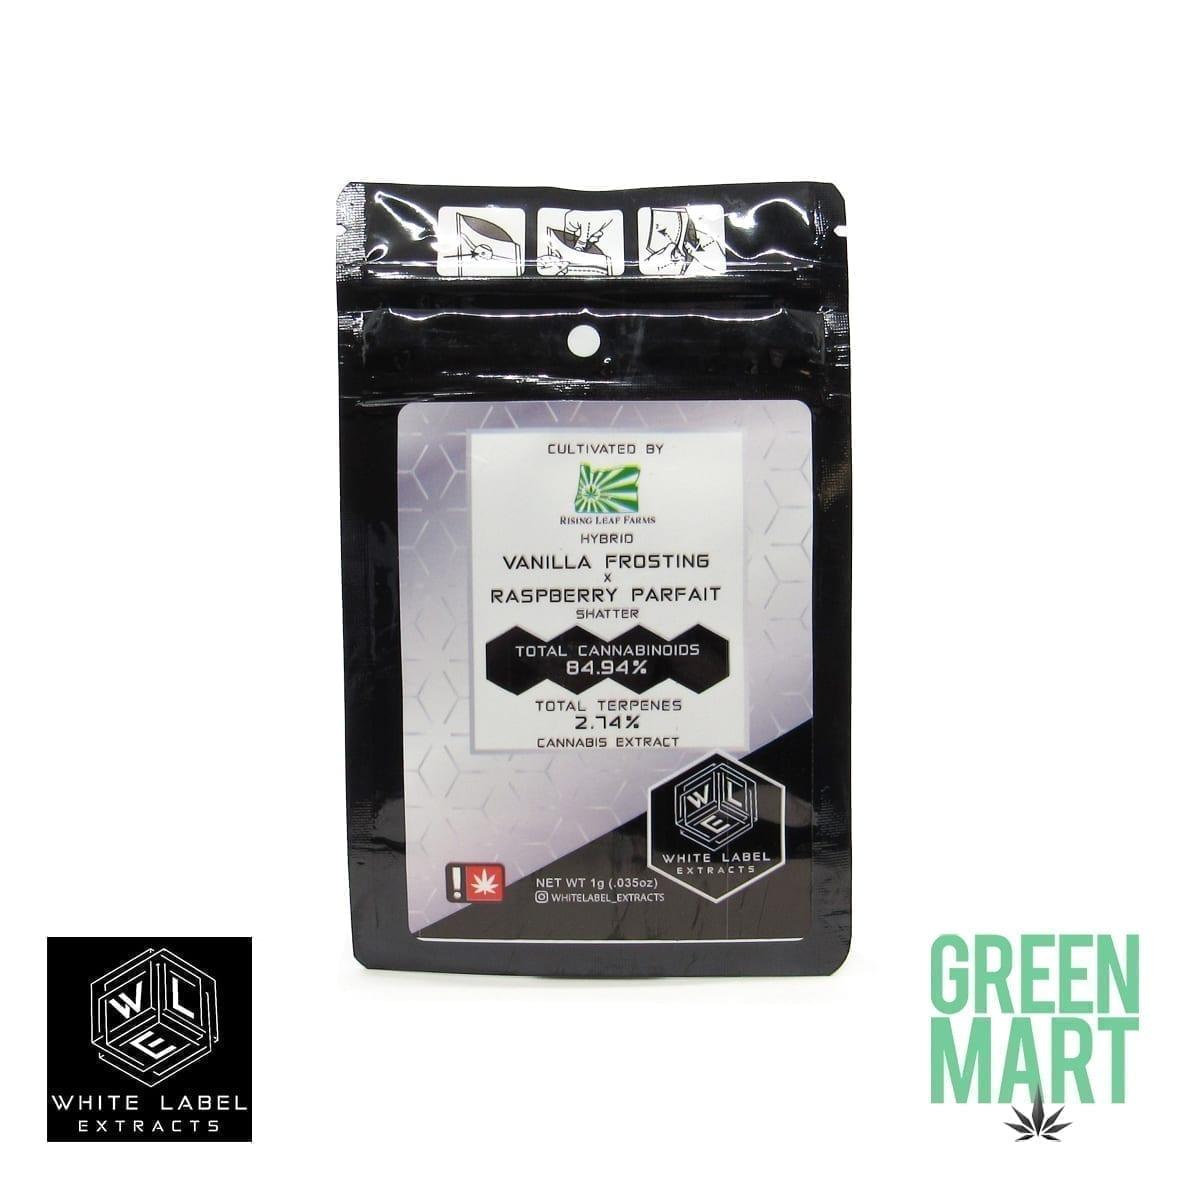 White Label Extracts - Vanilla Frosting X Raspberry Parfait